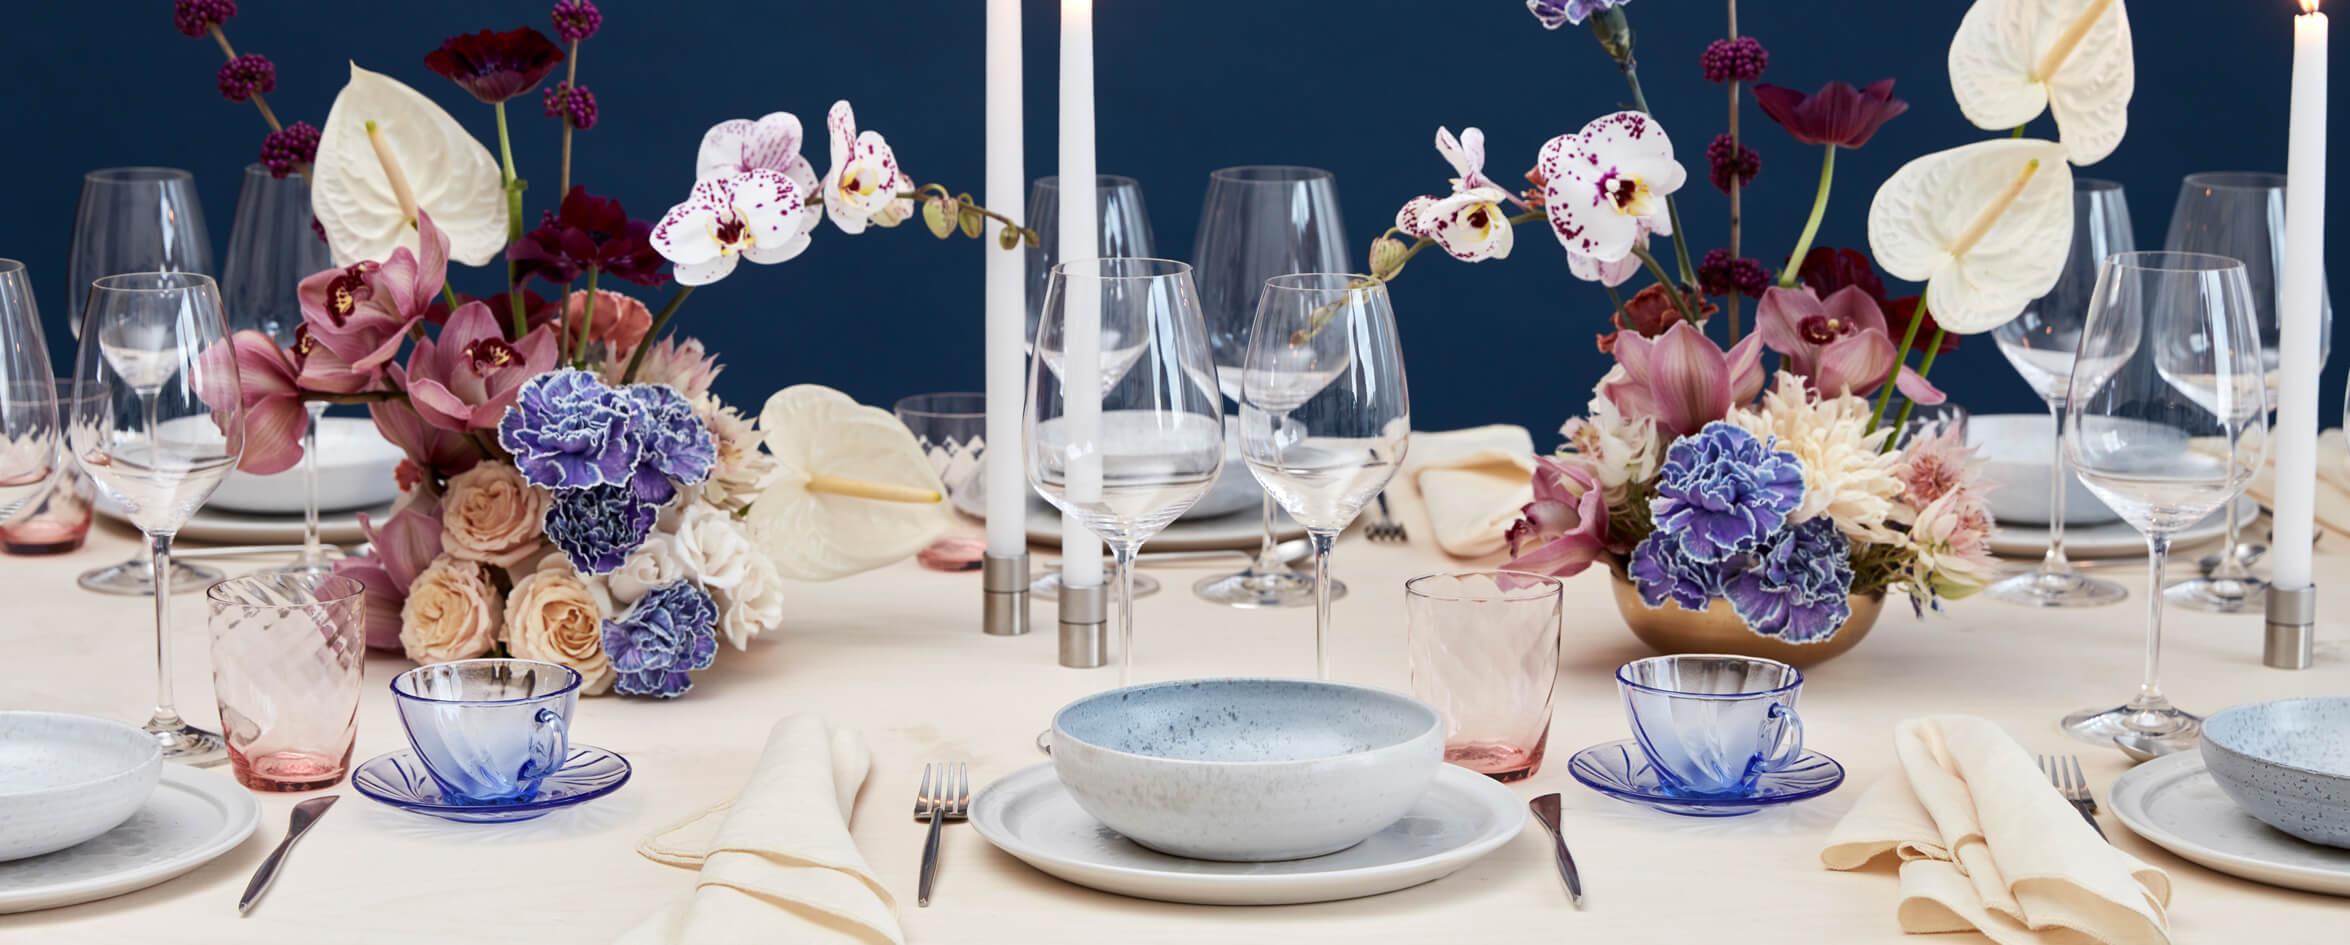 lej riedel glas_a table story2